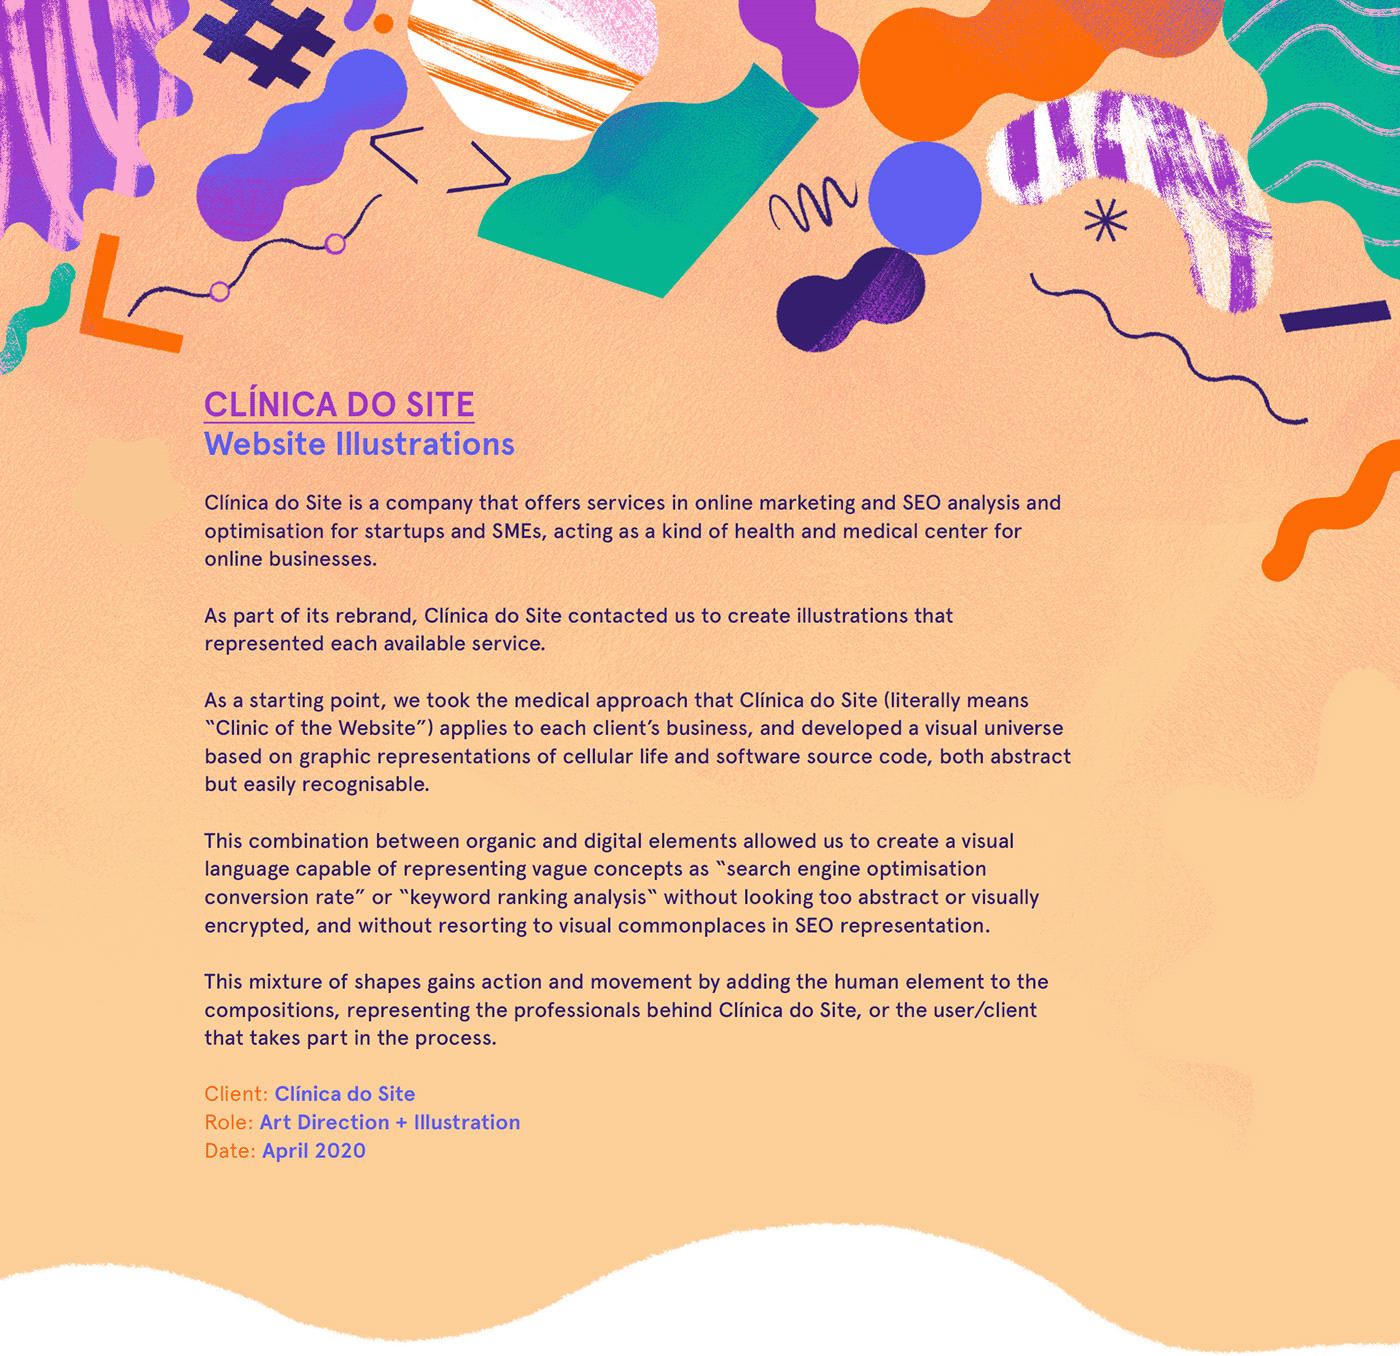 branding ,Character,characterdesign,geometry,ILLUSTRATION ,medical,molecules,shapes,Website,website illustration